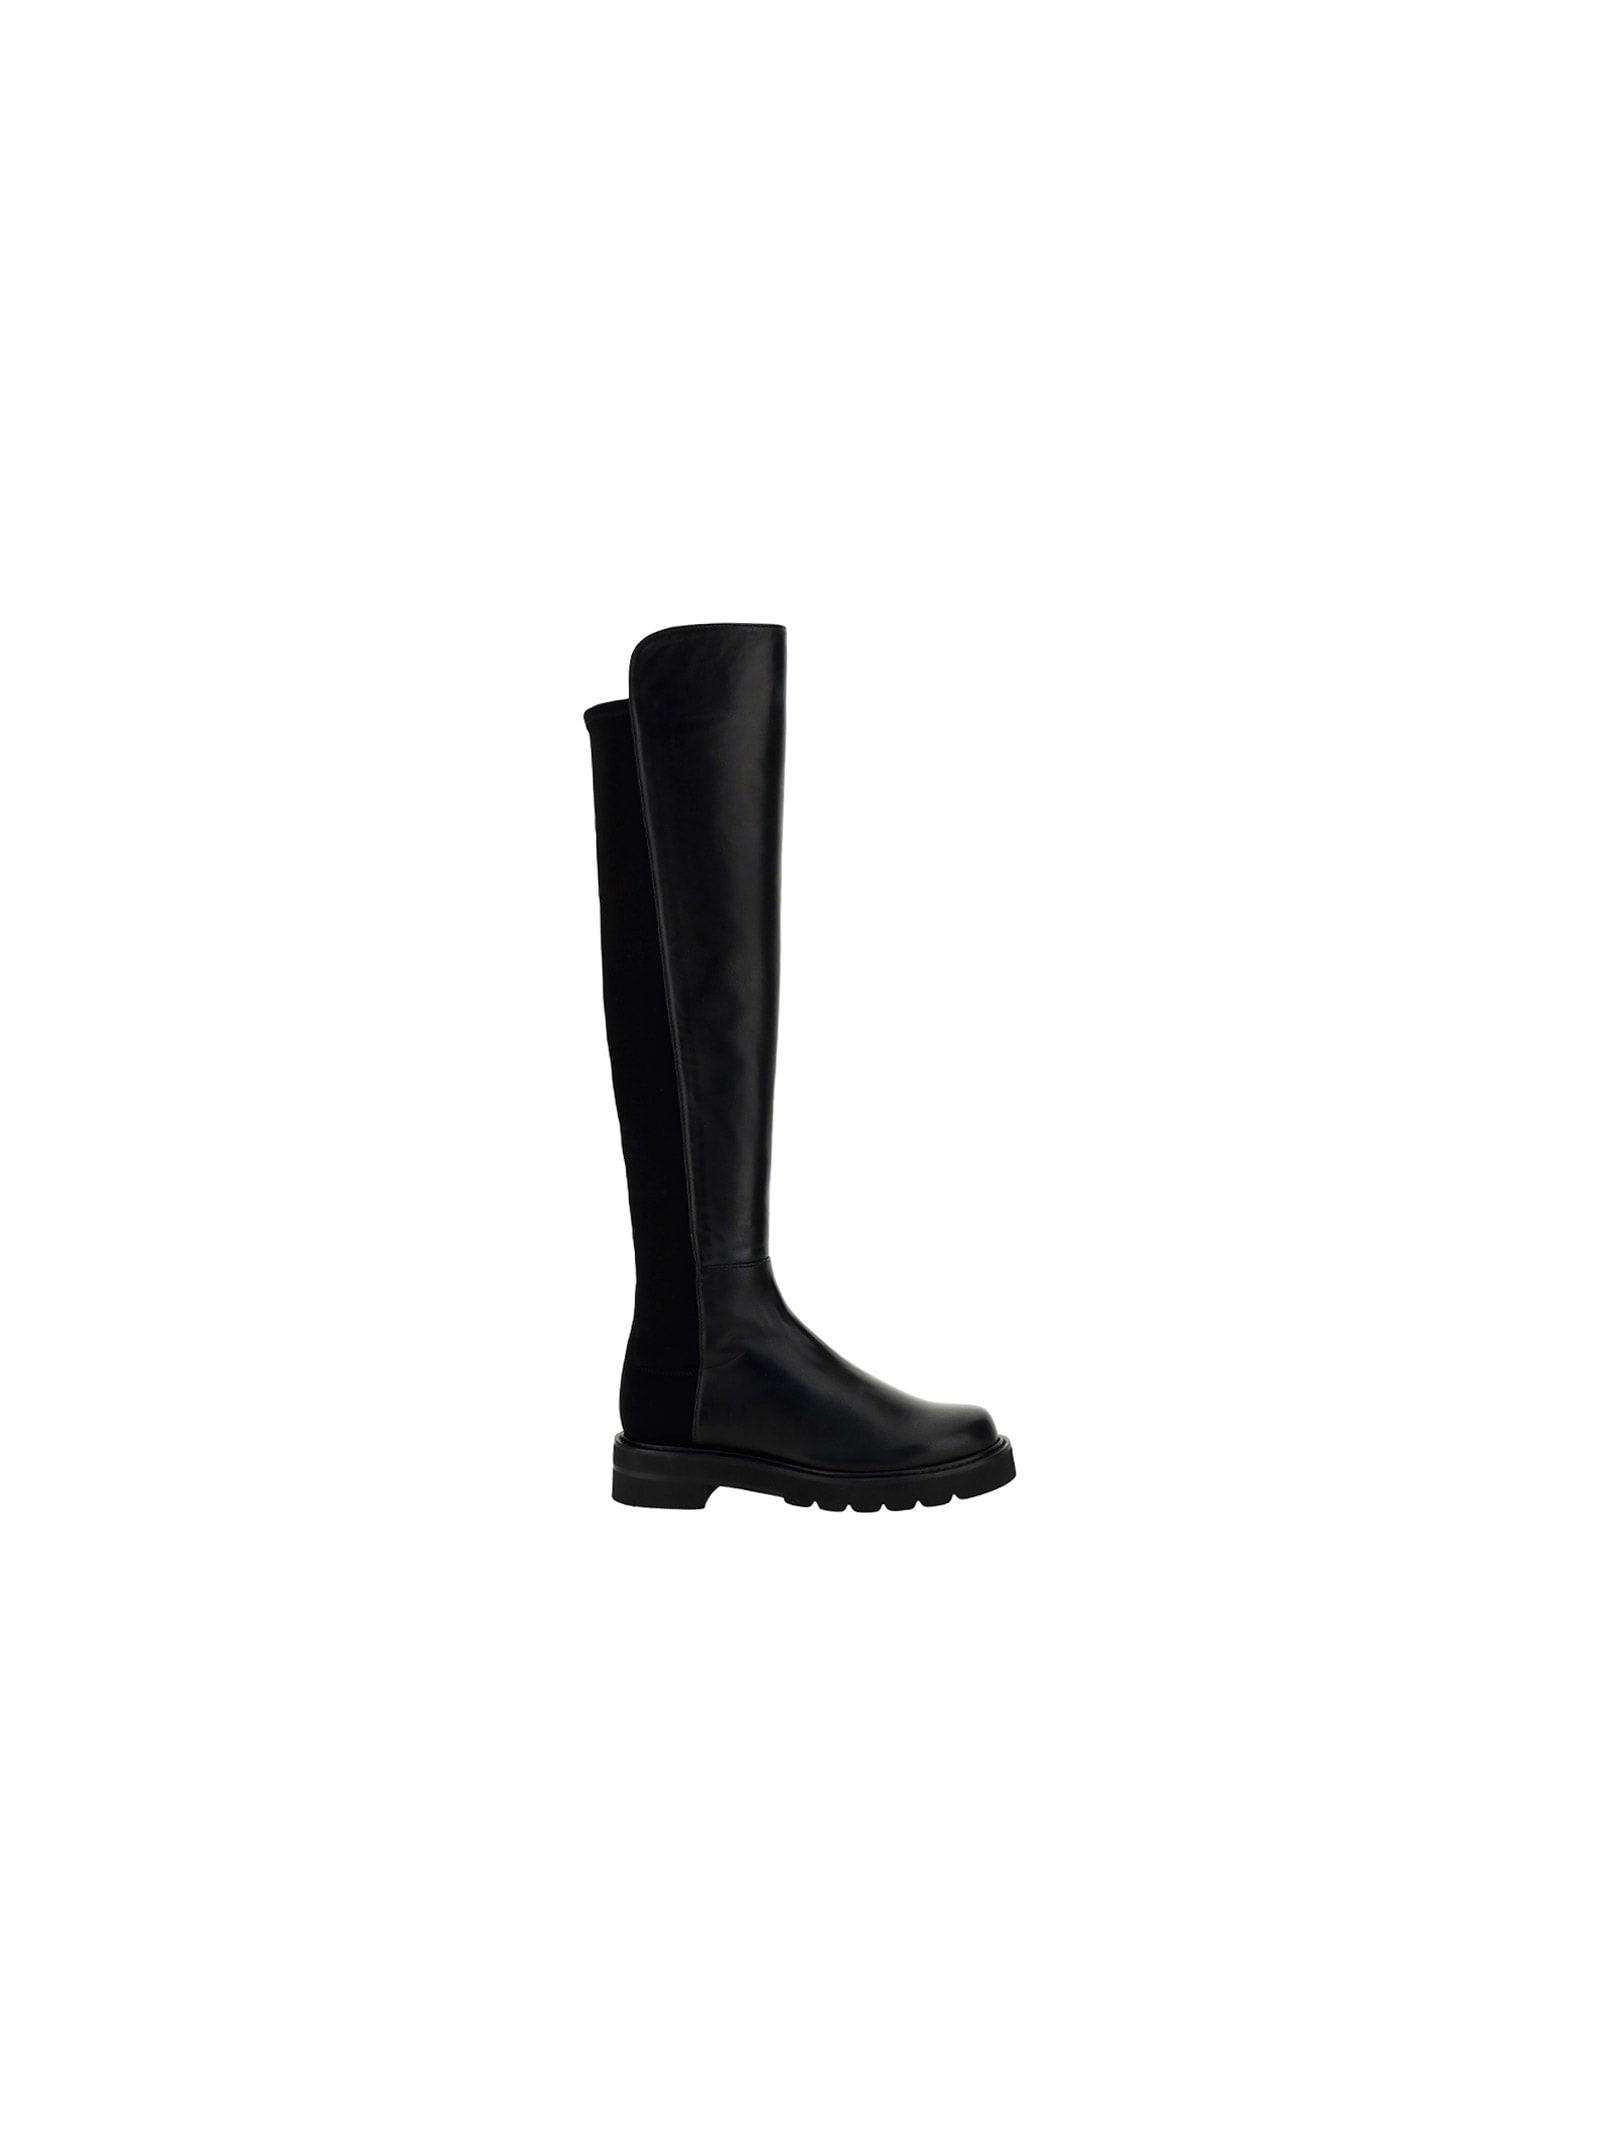 Buy Stuart Weitzman 5050 Lift Boots online, shop Stuart Weitzman shoes with free shipping